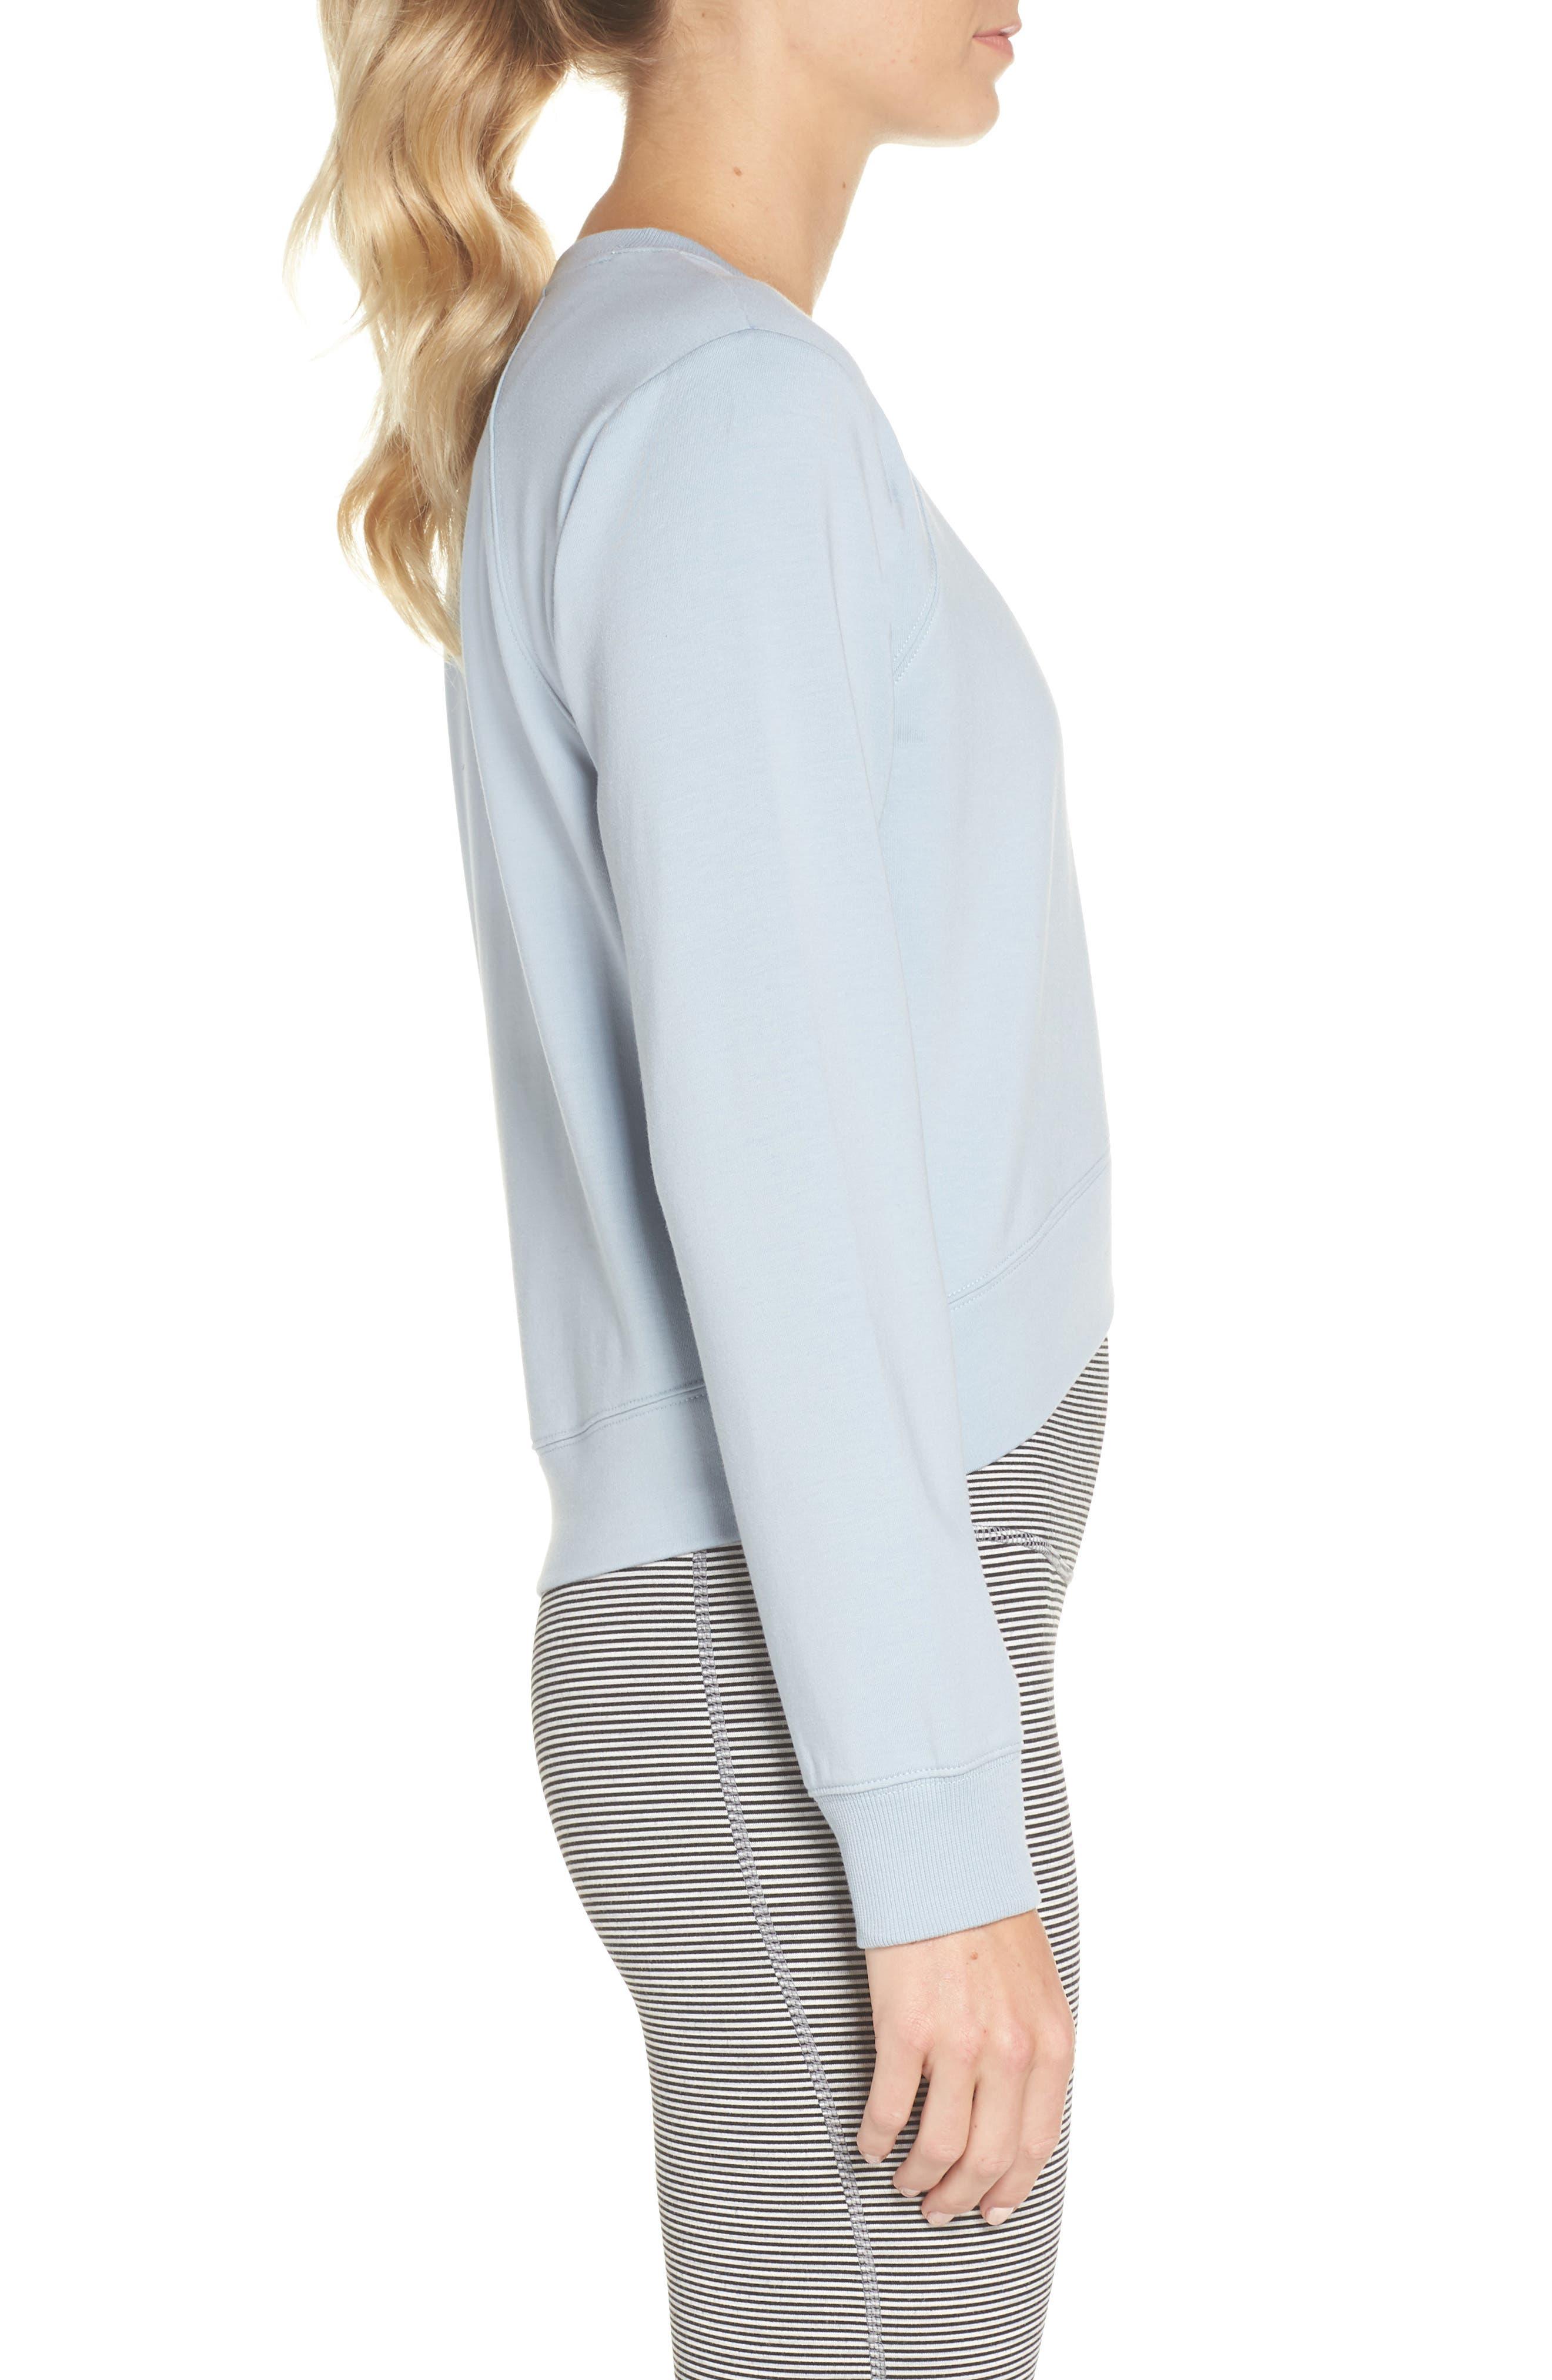 Uplifted Sweatshirt,                             Alternate thumbnail 3, color,                             420